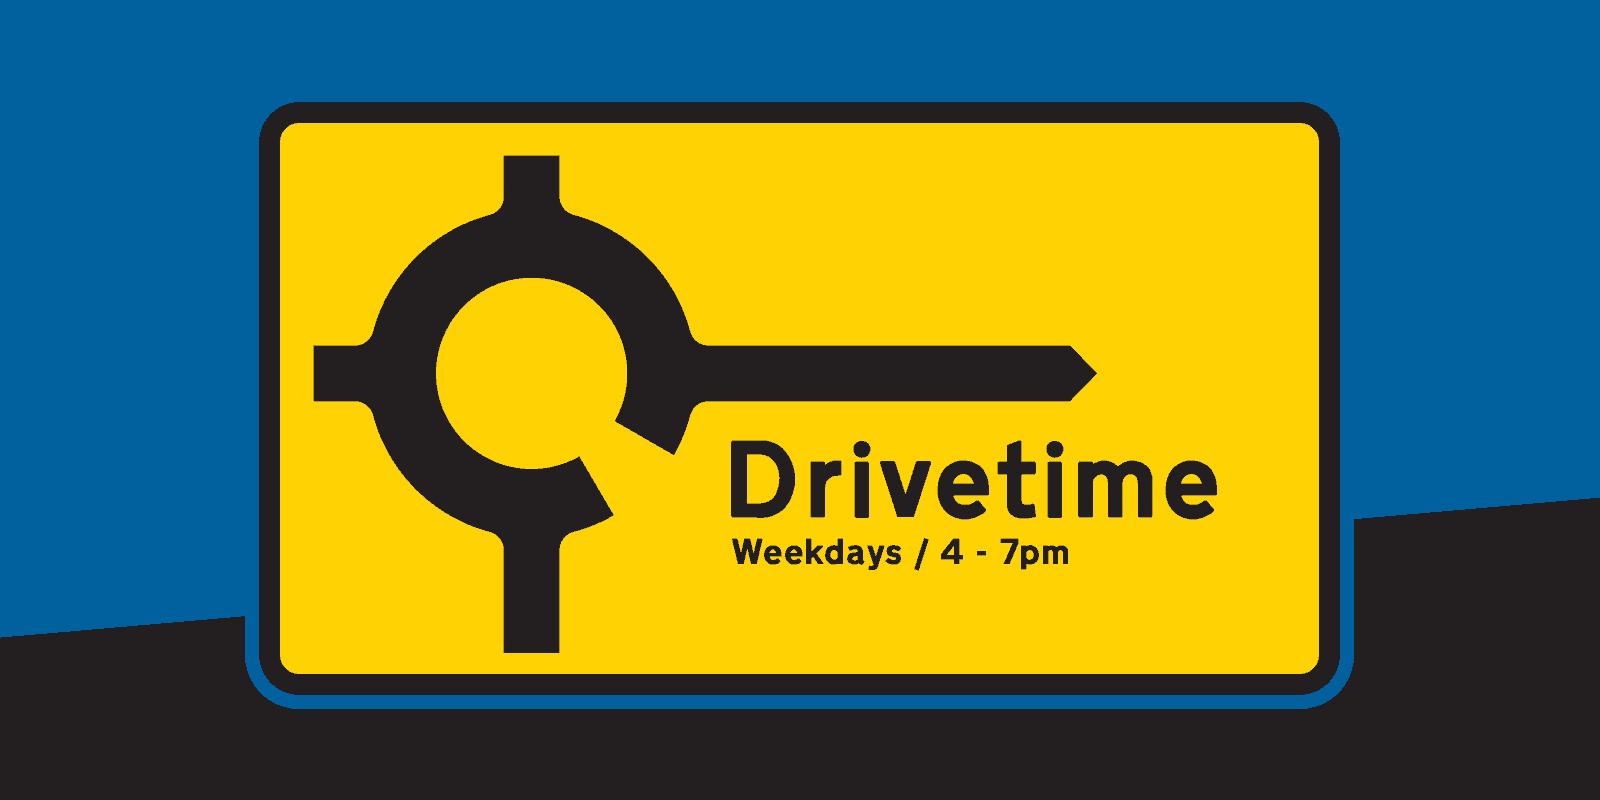 Drivetime on Gateway 97.8